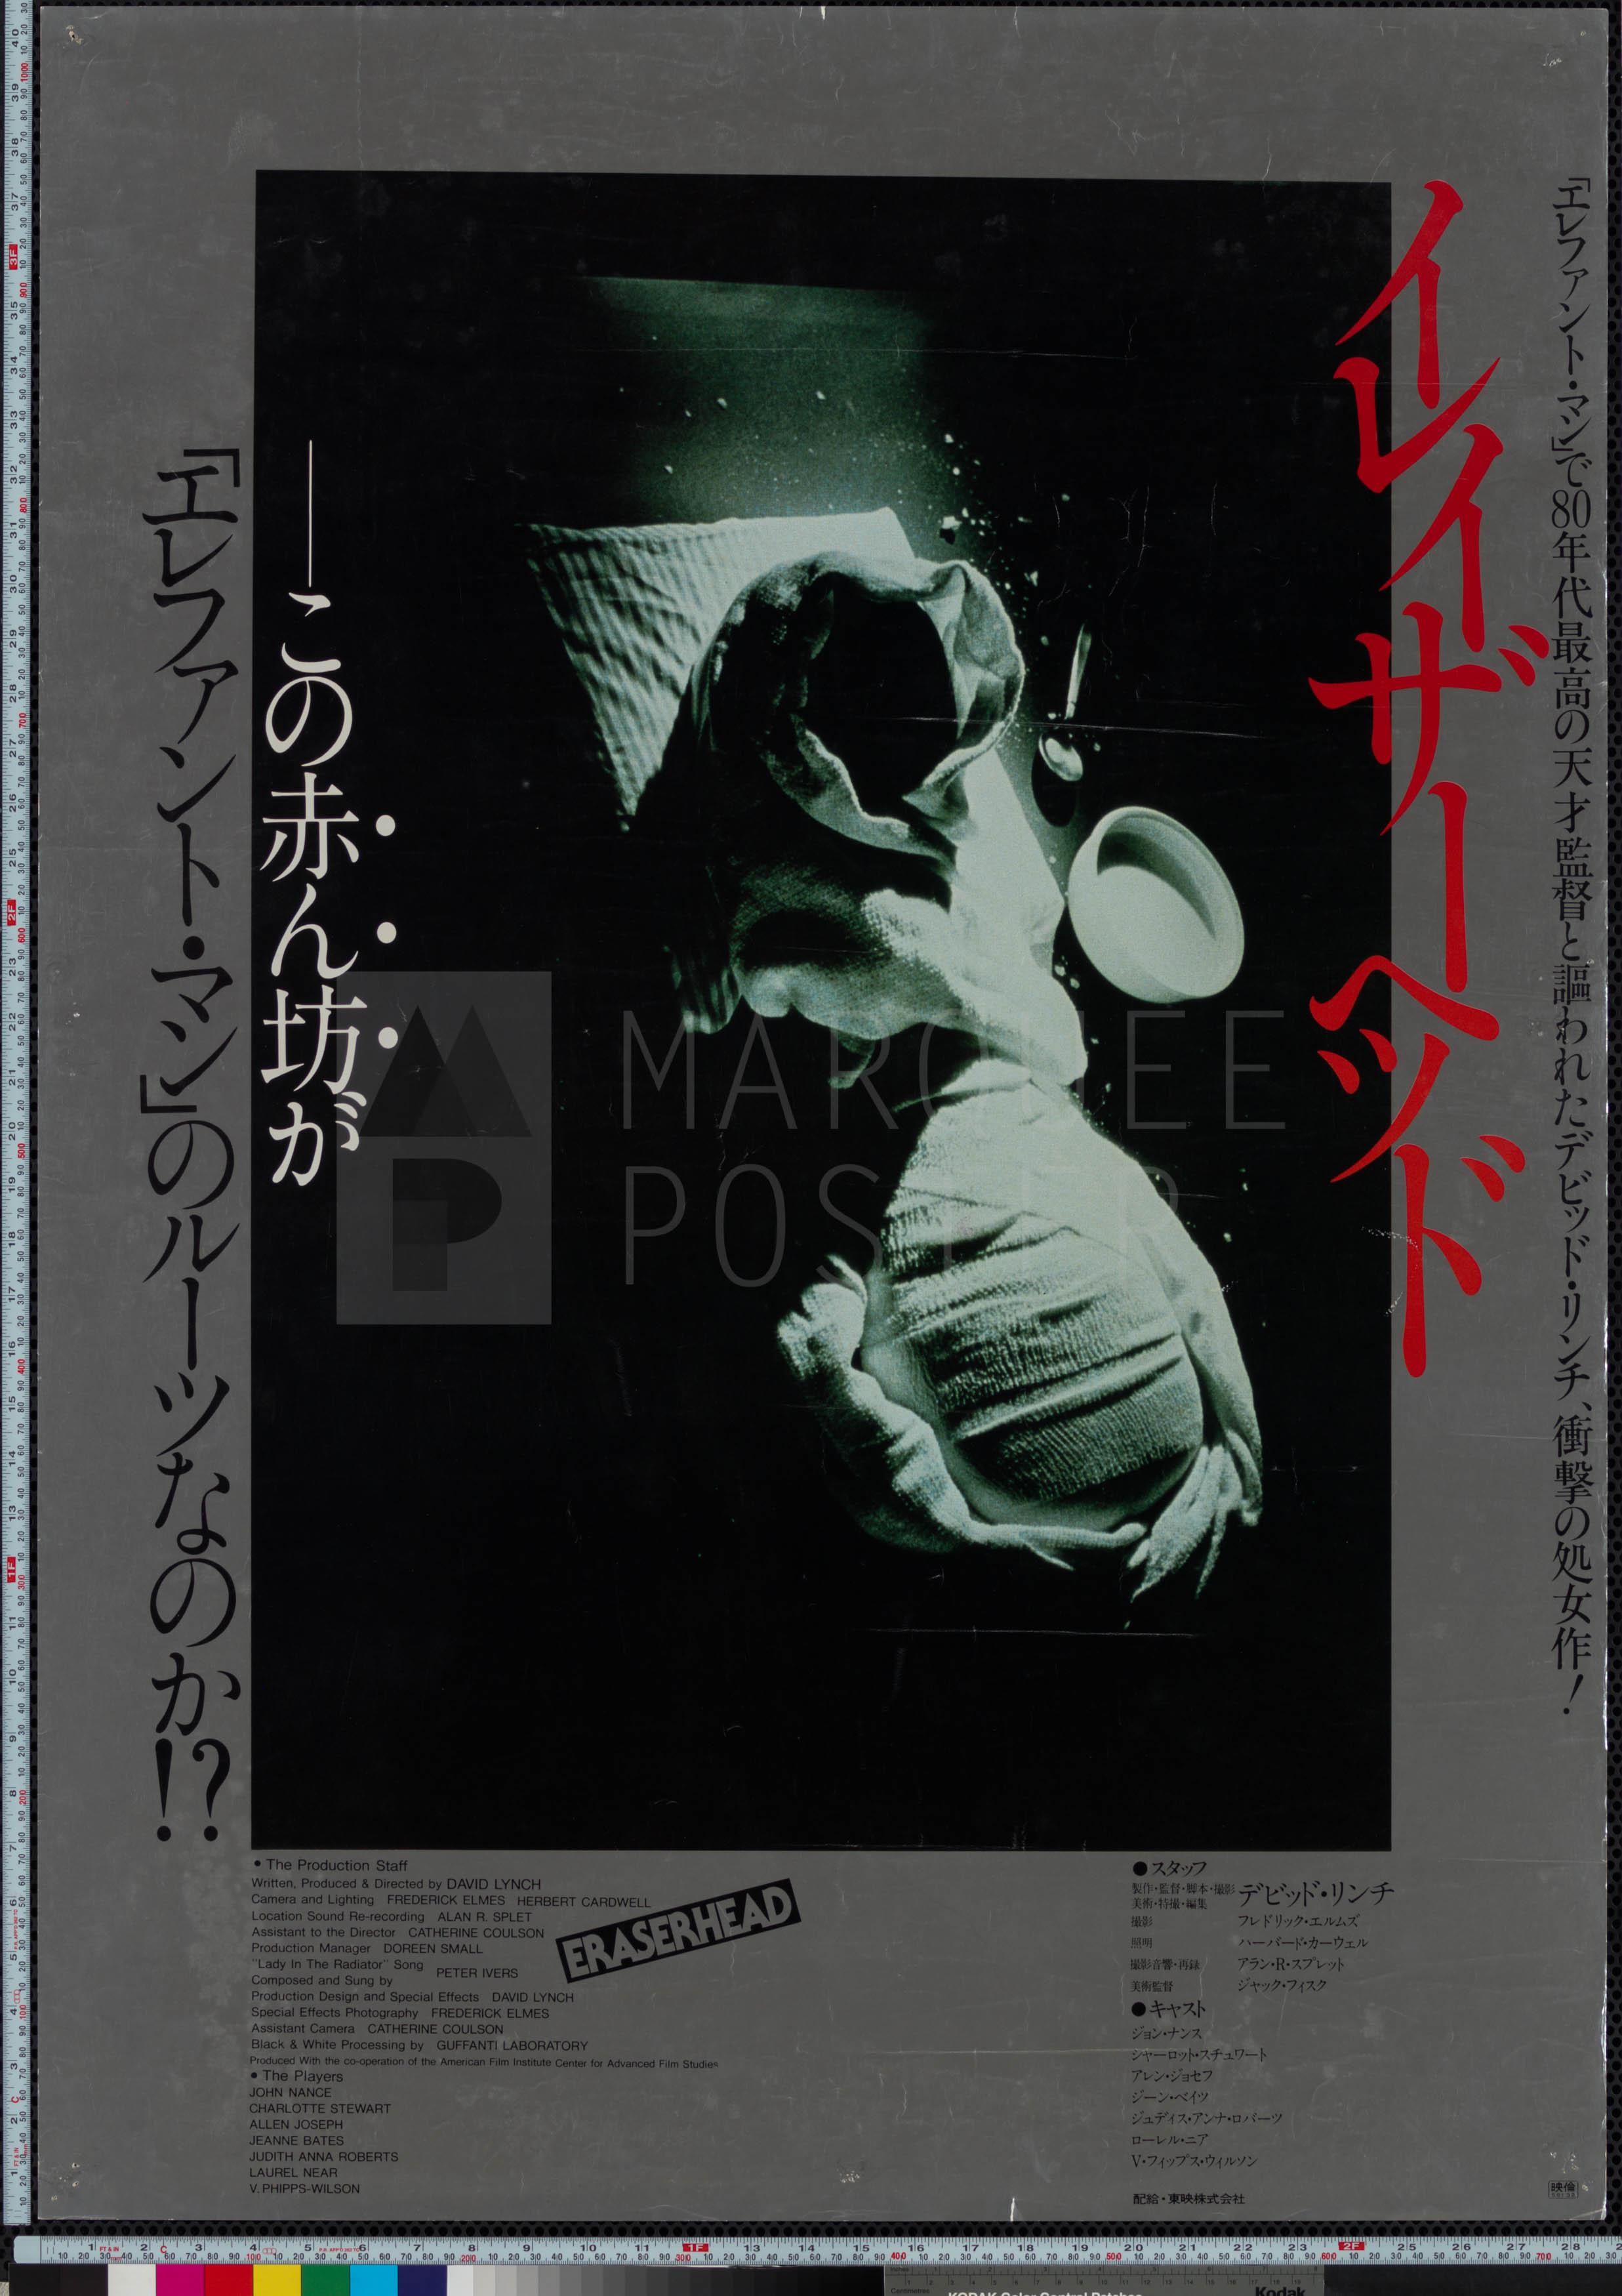 36-eraserhead-japanese-b1-1981-02